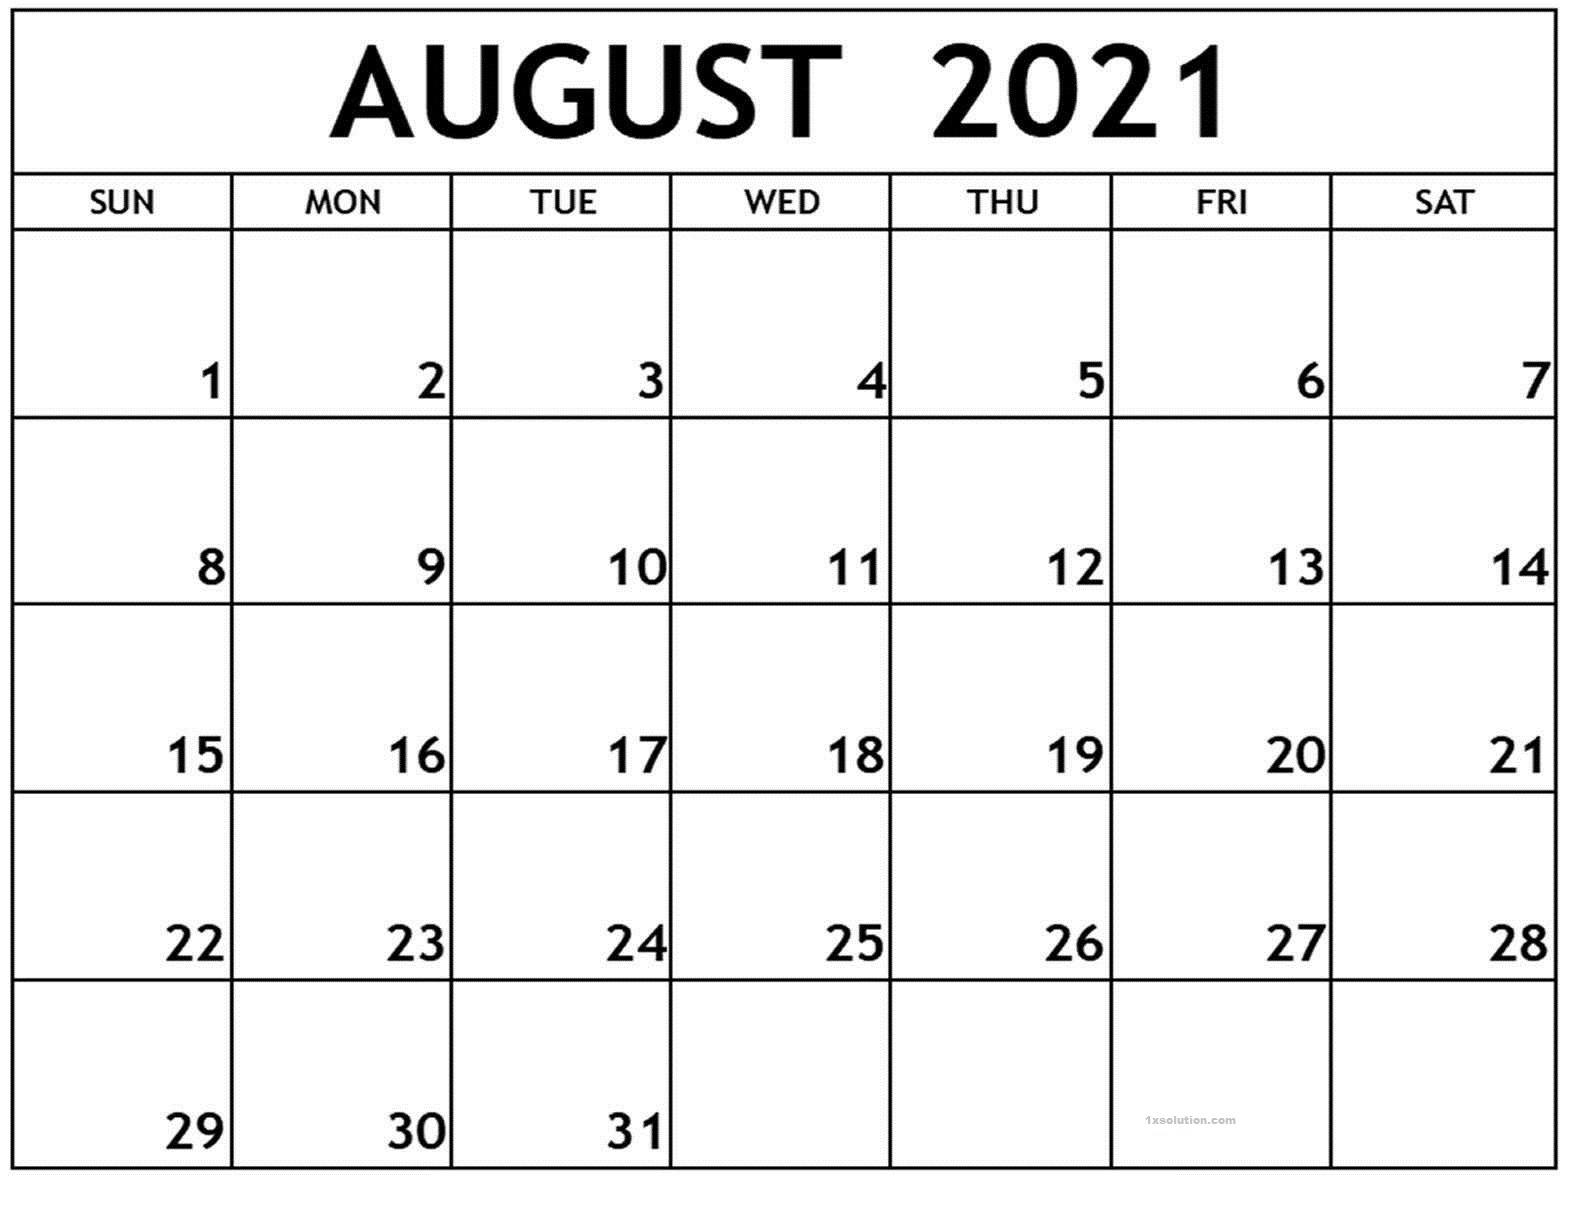 August 2021 Calendar Printable Schedule Excelsheet | Calendar August 2021 Calendar Reading